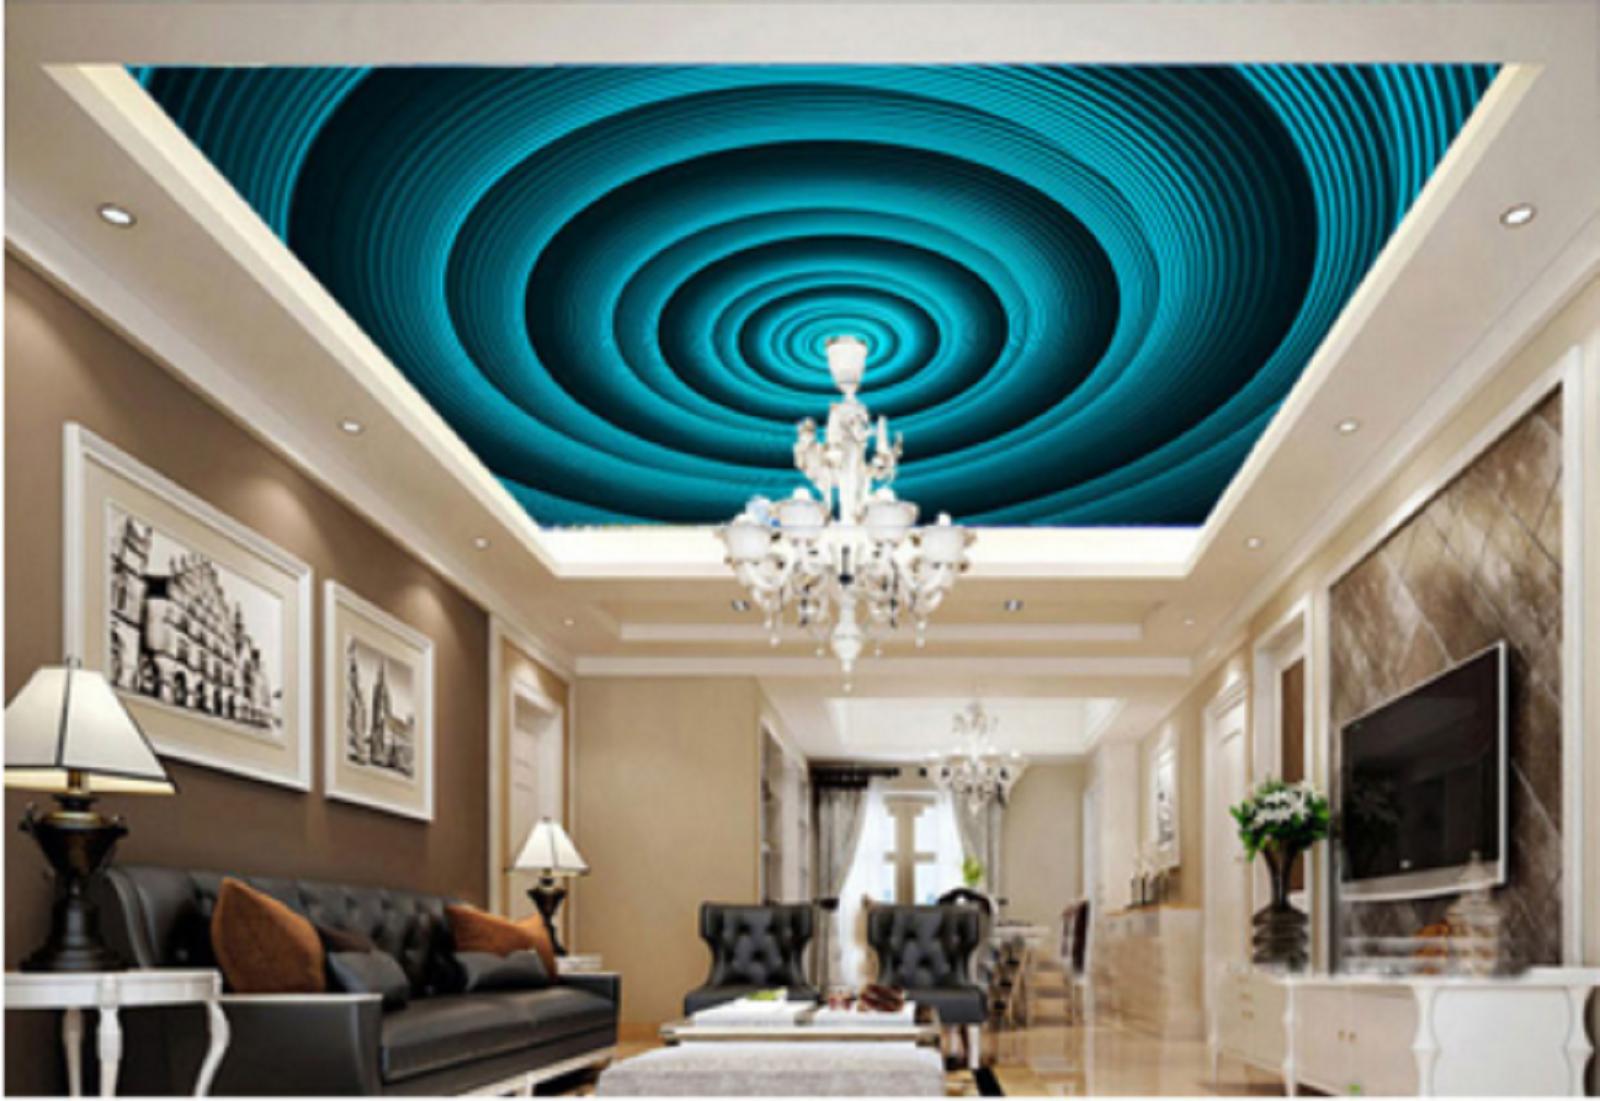 3D Ultrasonic Wave 7 Ceiling WallPaper Murals Wall Print Decal Deco AJ WALLPAPER